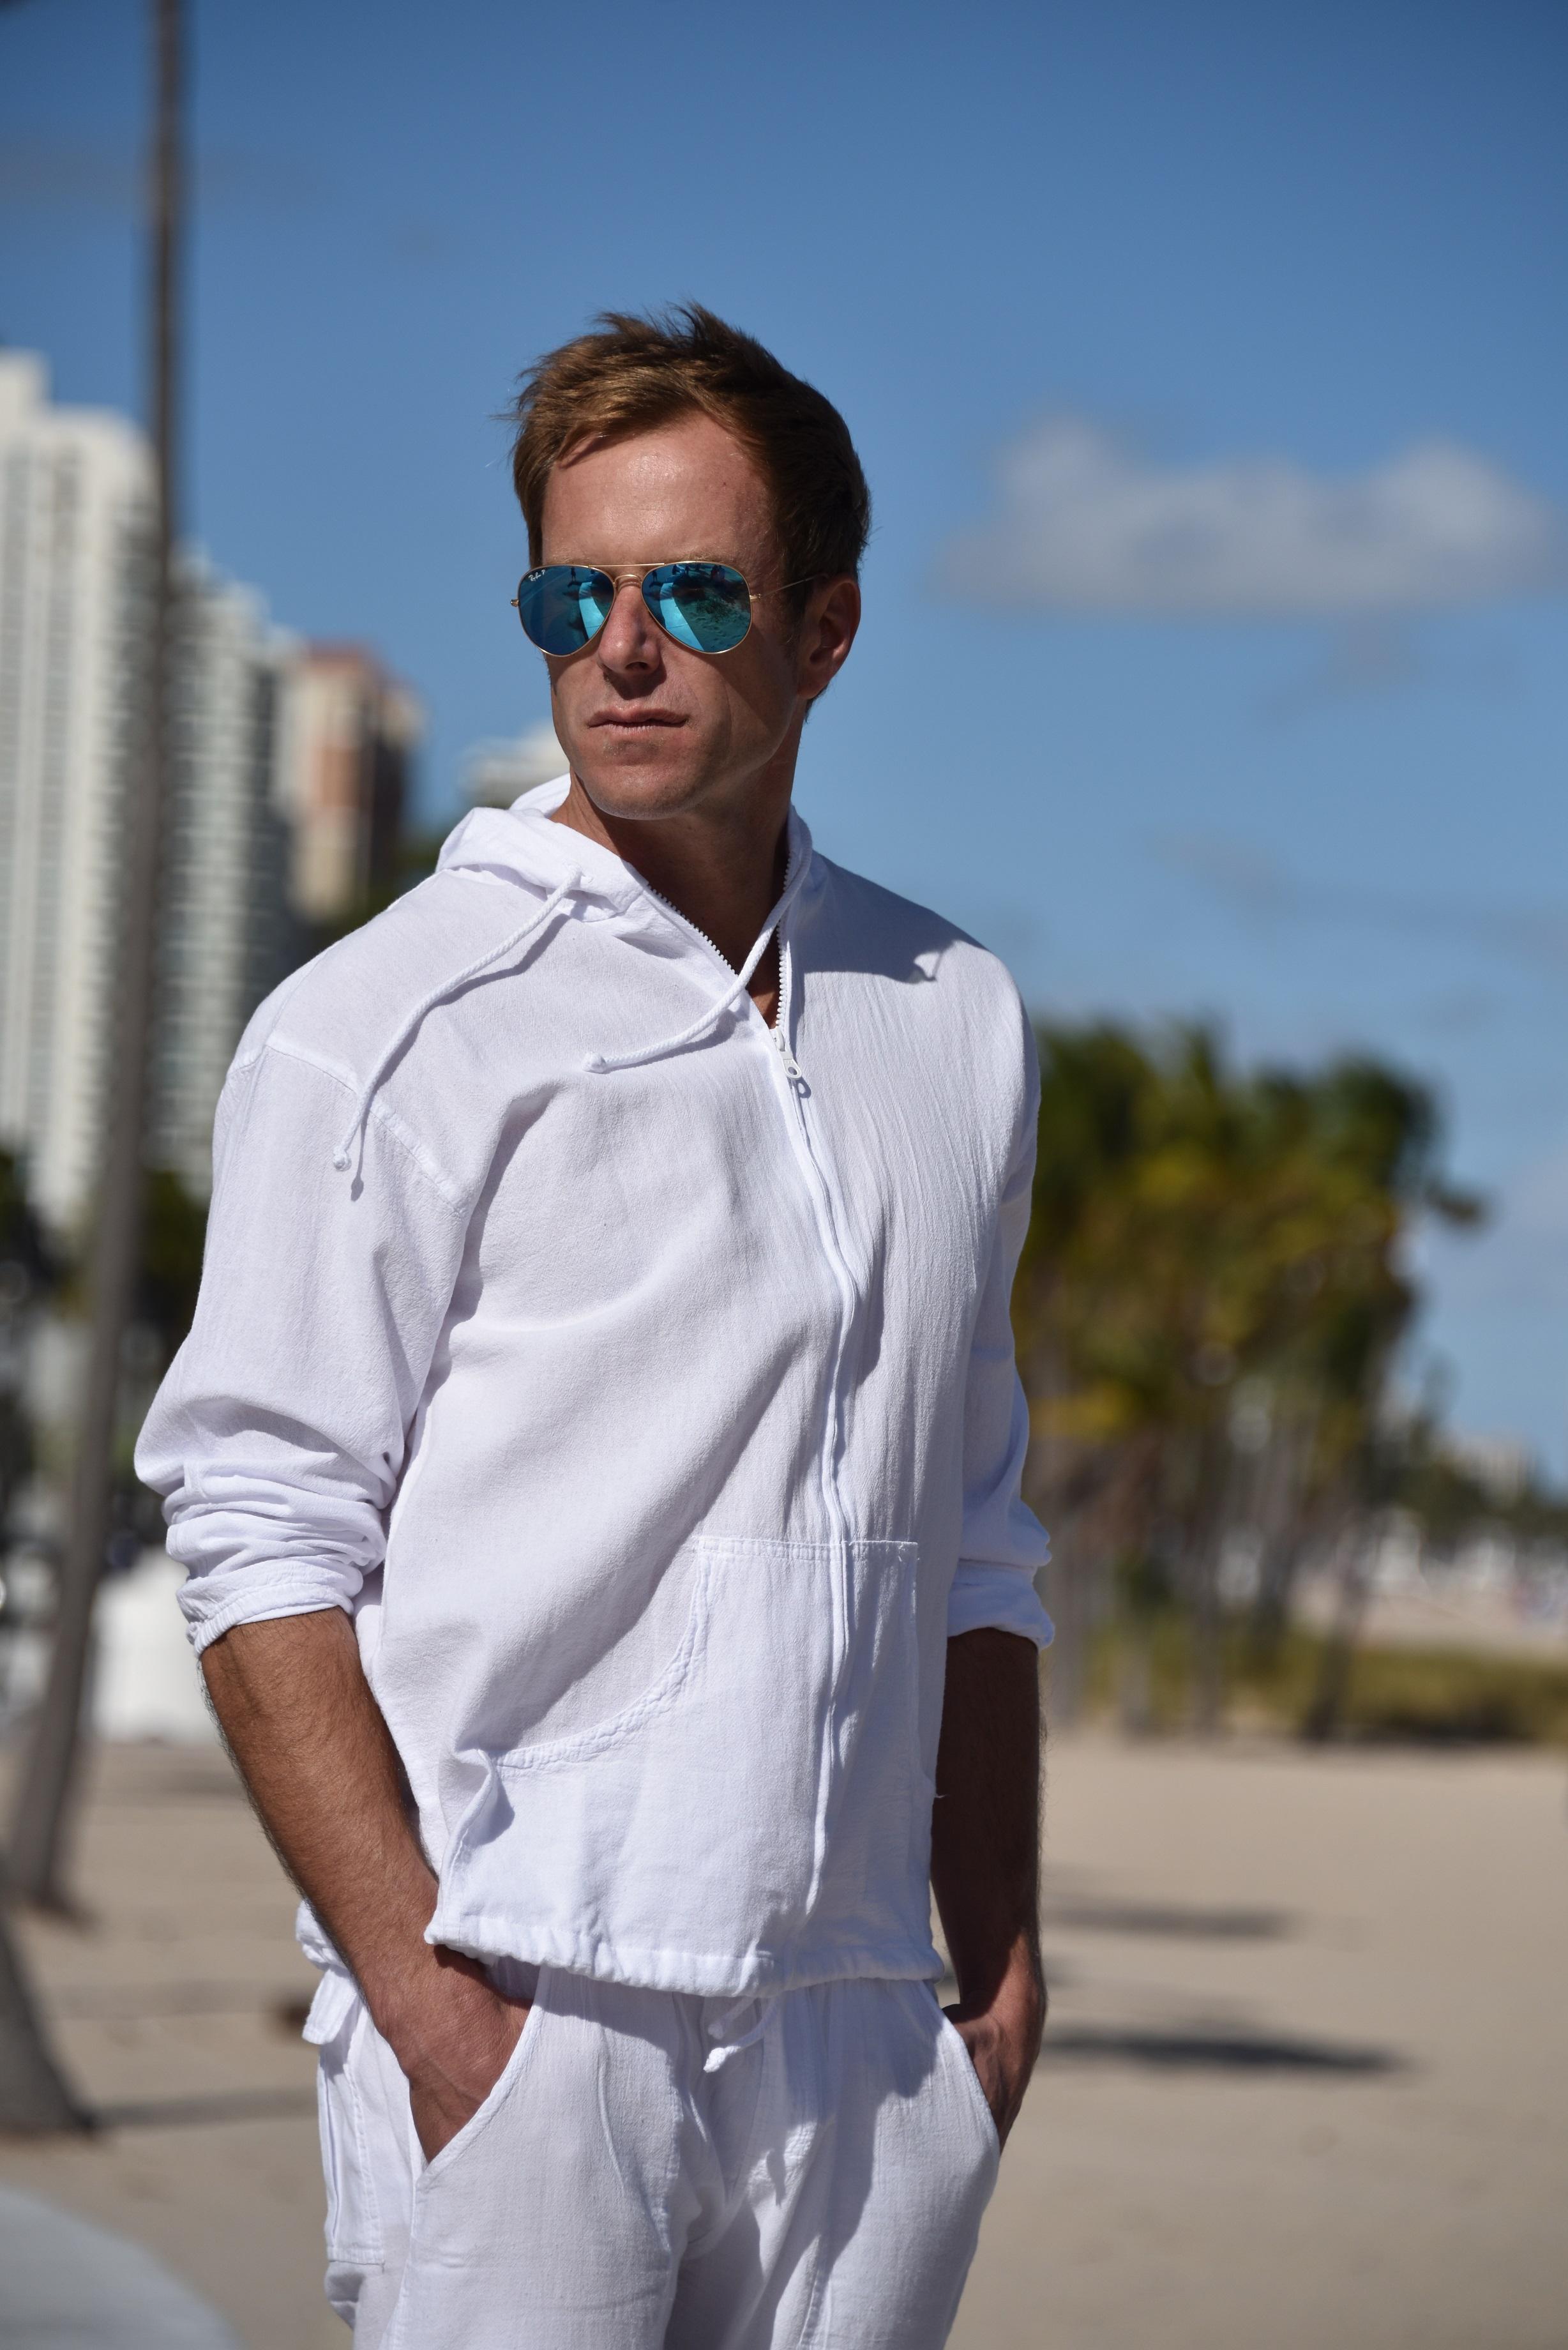 Cotton Wind Jacket